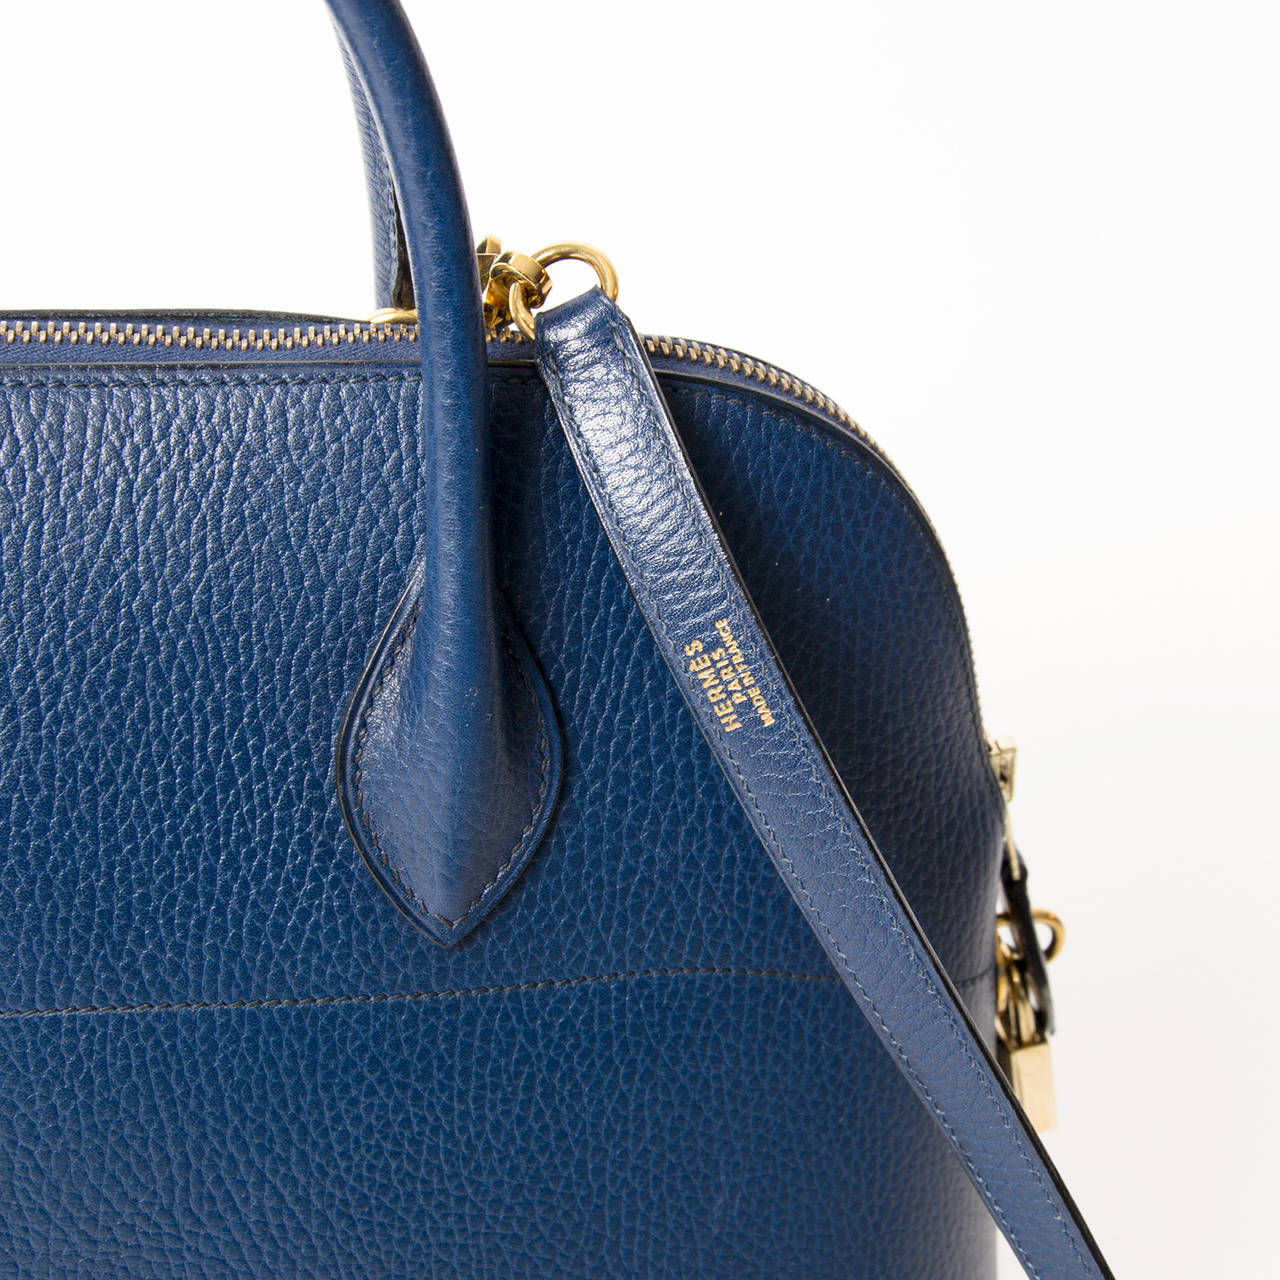 faux ostrich handbag - 1995 hermes bolide 35 brown ostrich ghw excellent condition ...